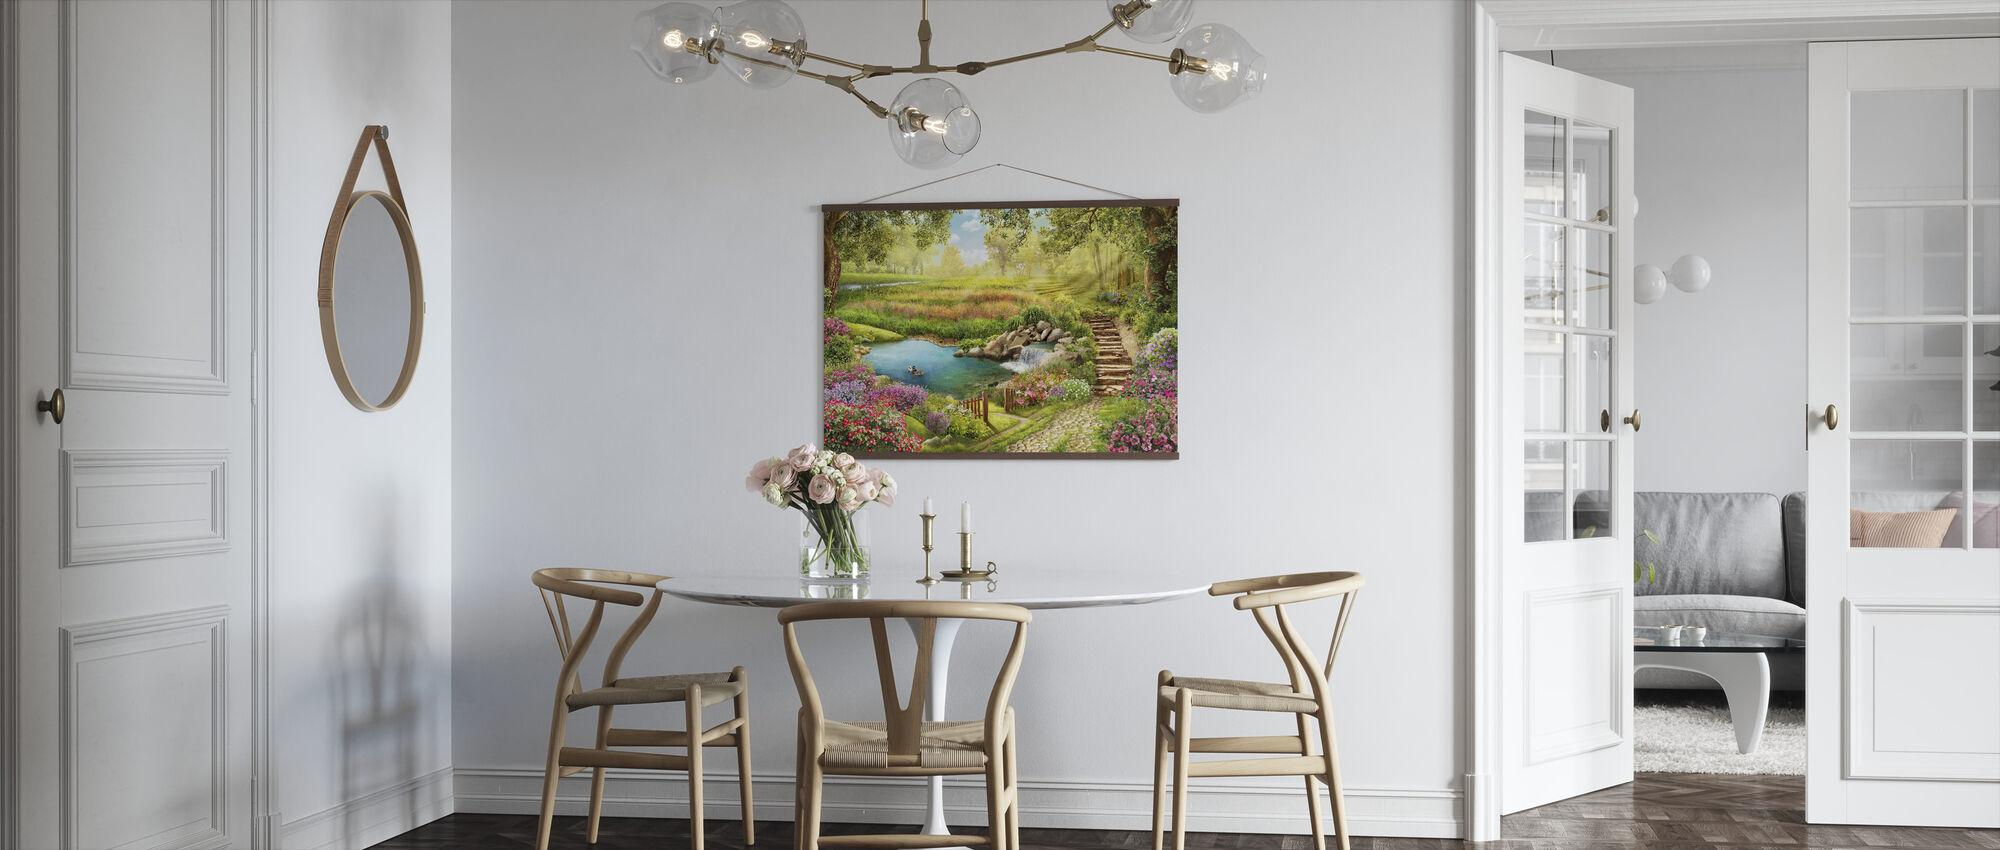 Ducks Paradise - Poster - Kitchen